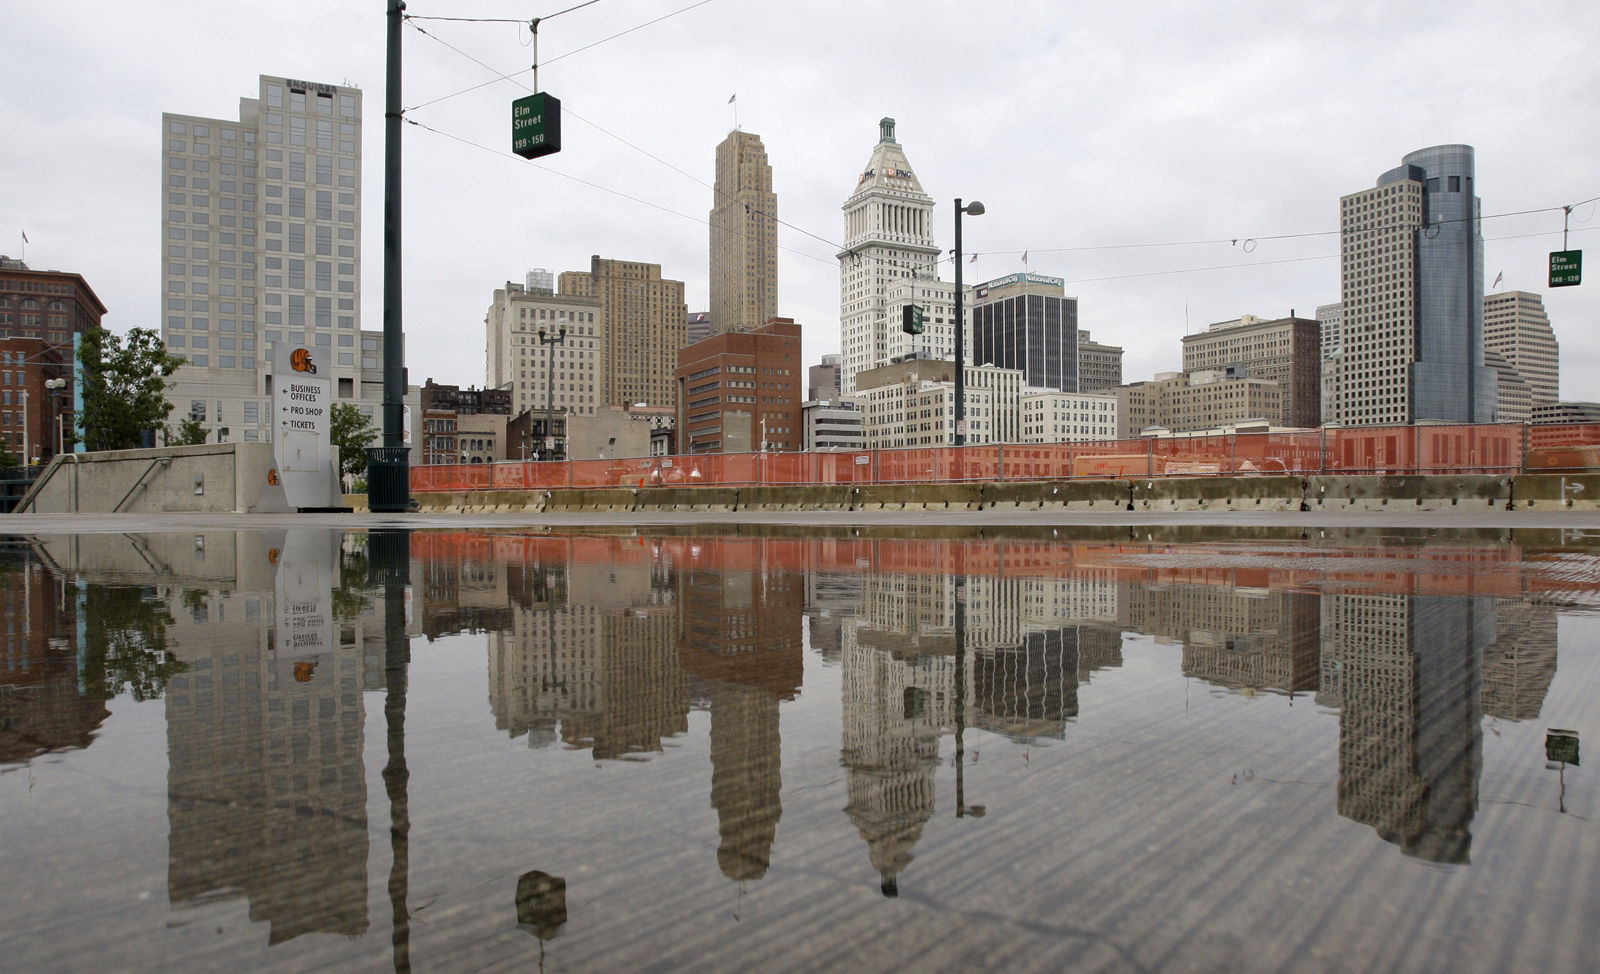 Cincinnati, Ohio comes in second on Terminix's list. (AP Photo/Al Behrman)